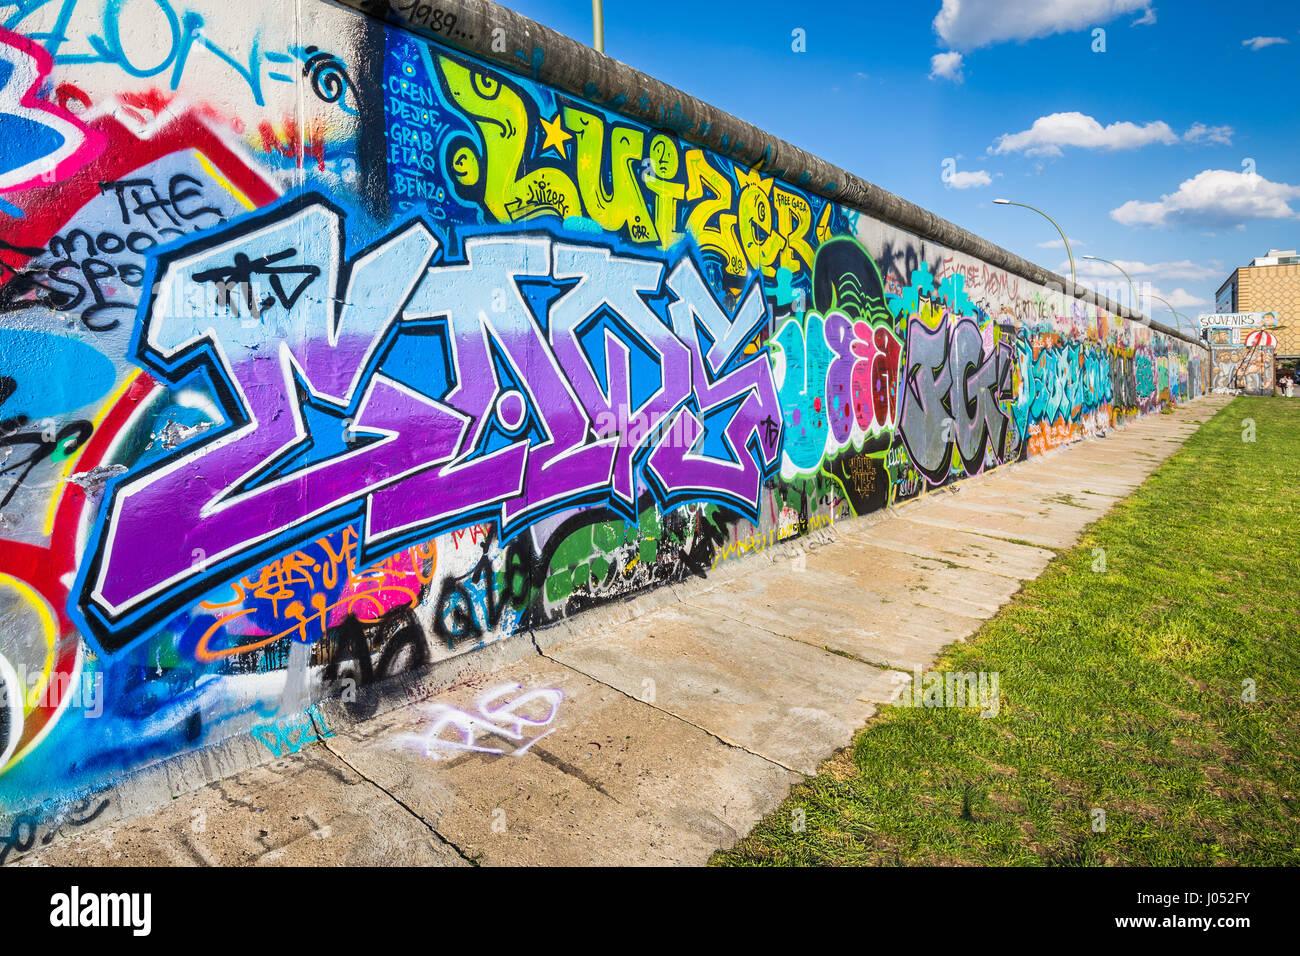 Vista panorámica del famoso Muro de Berlín están decoradas con coloridas graffiti street art en el Imagen De Stock